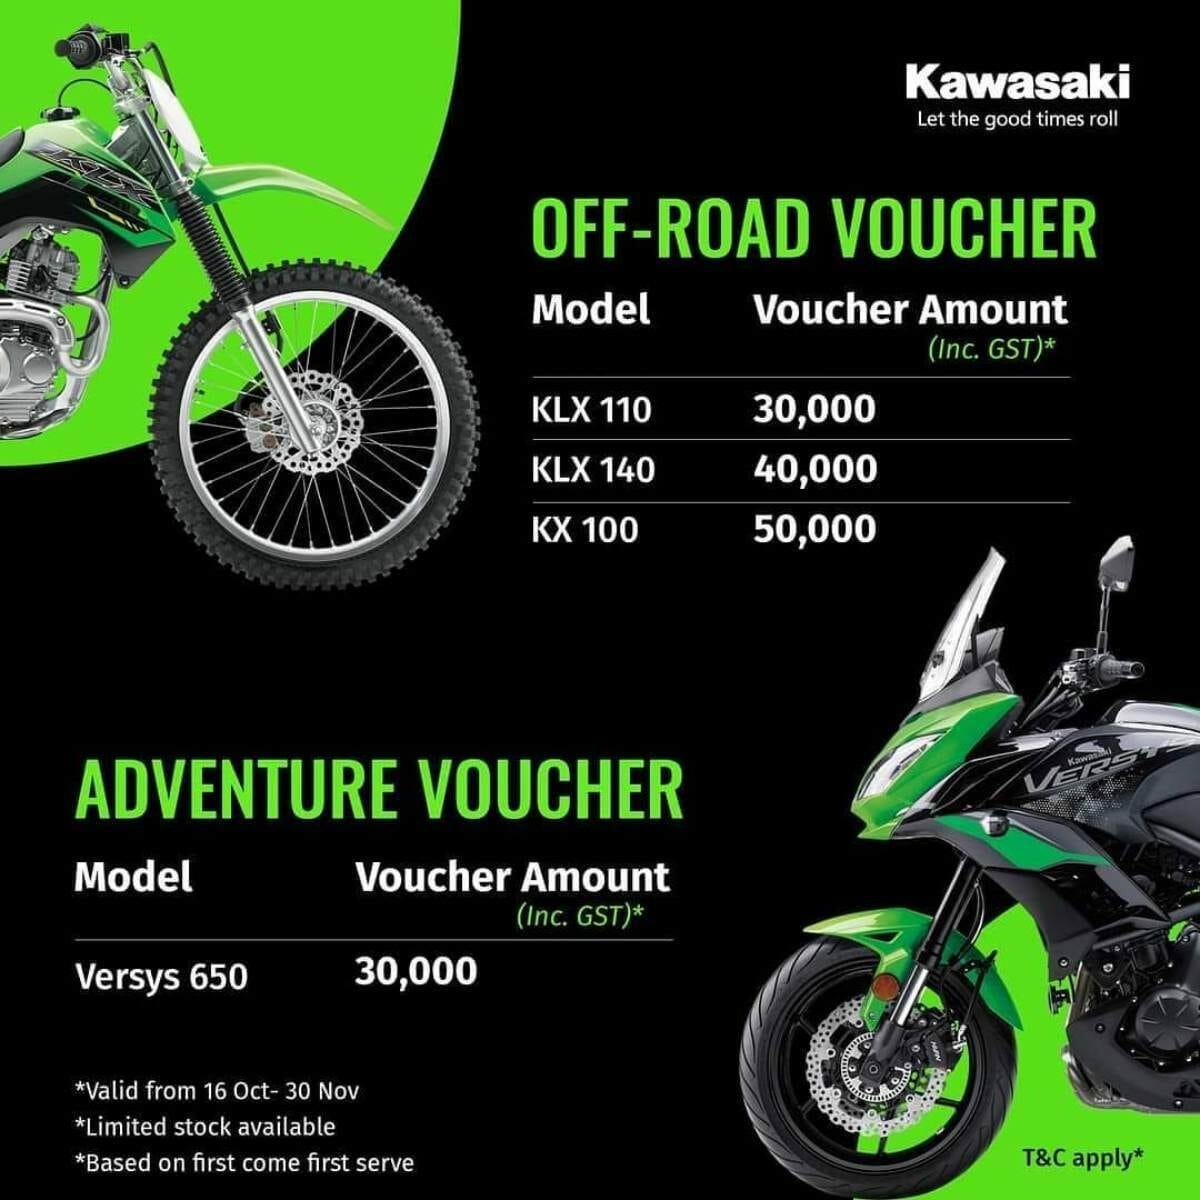 Kawasaki vouchers